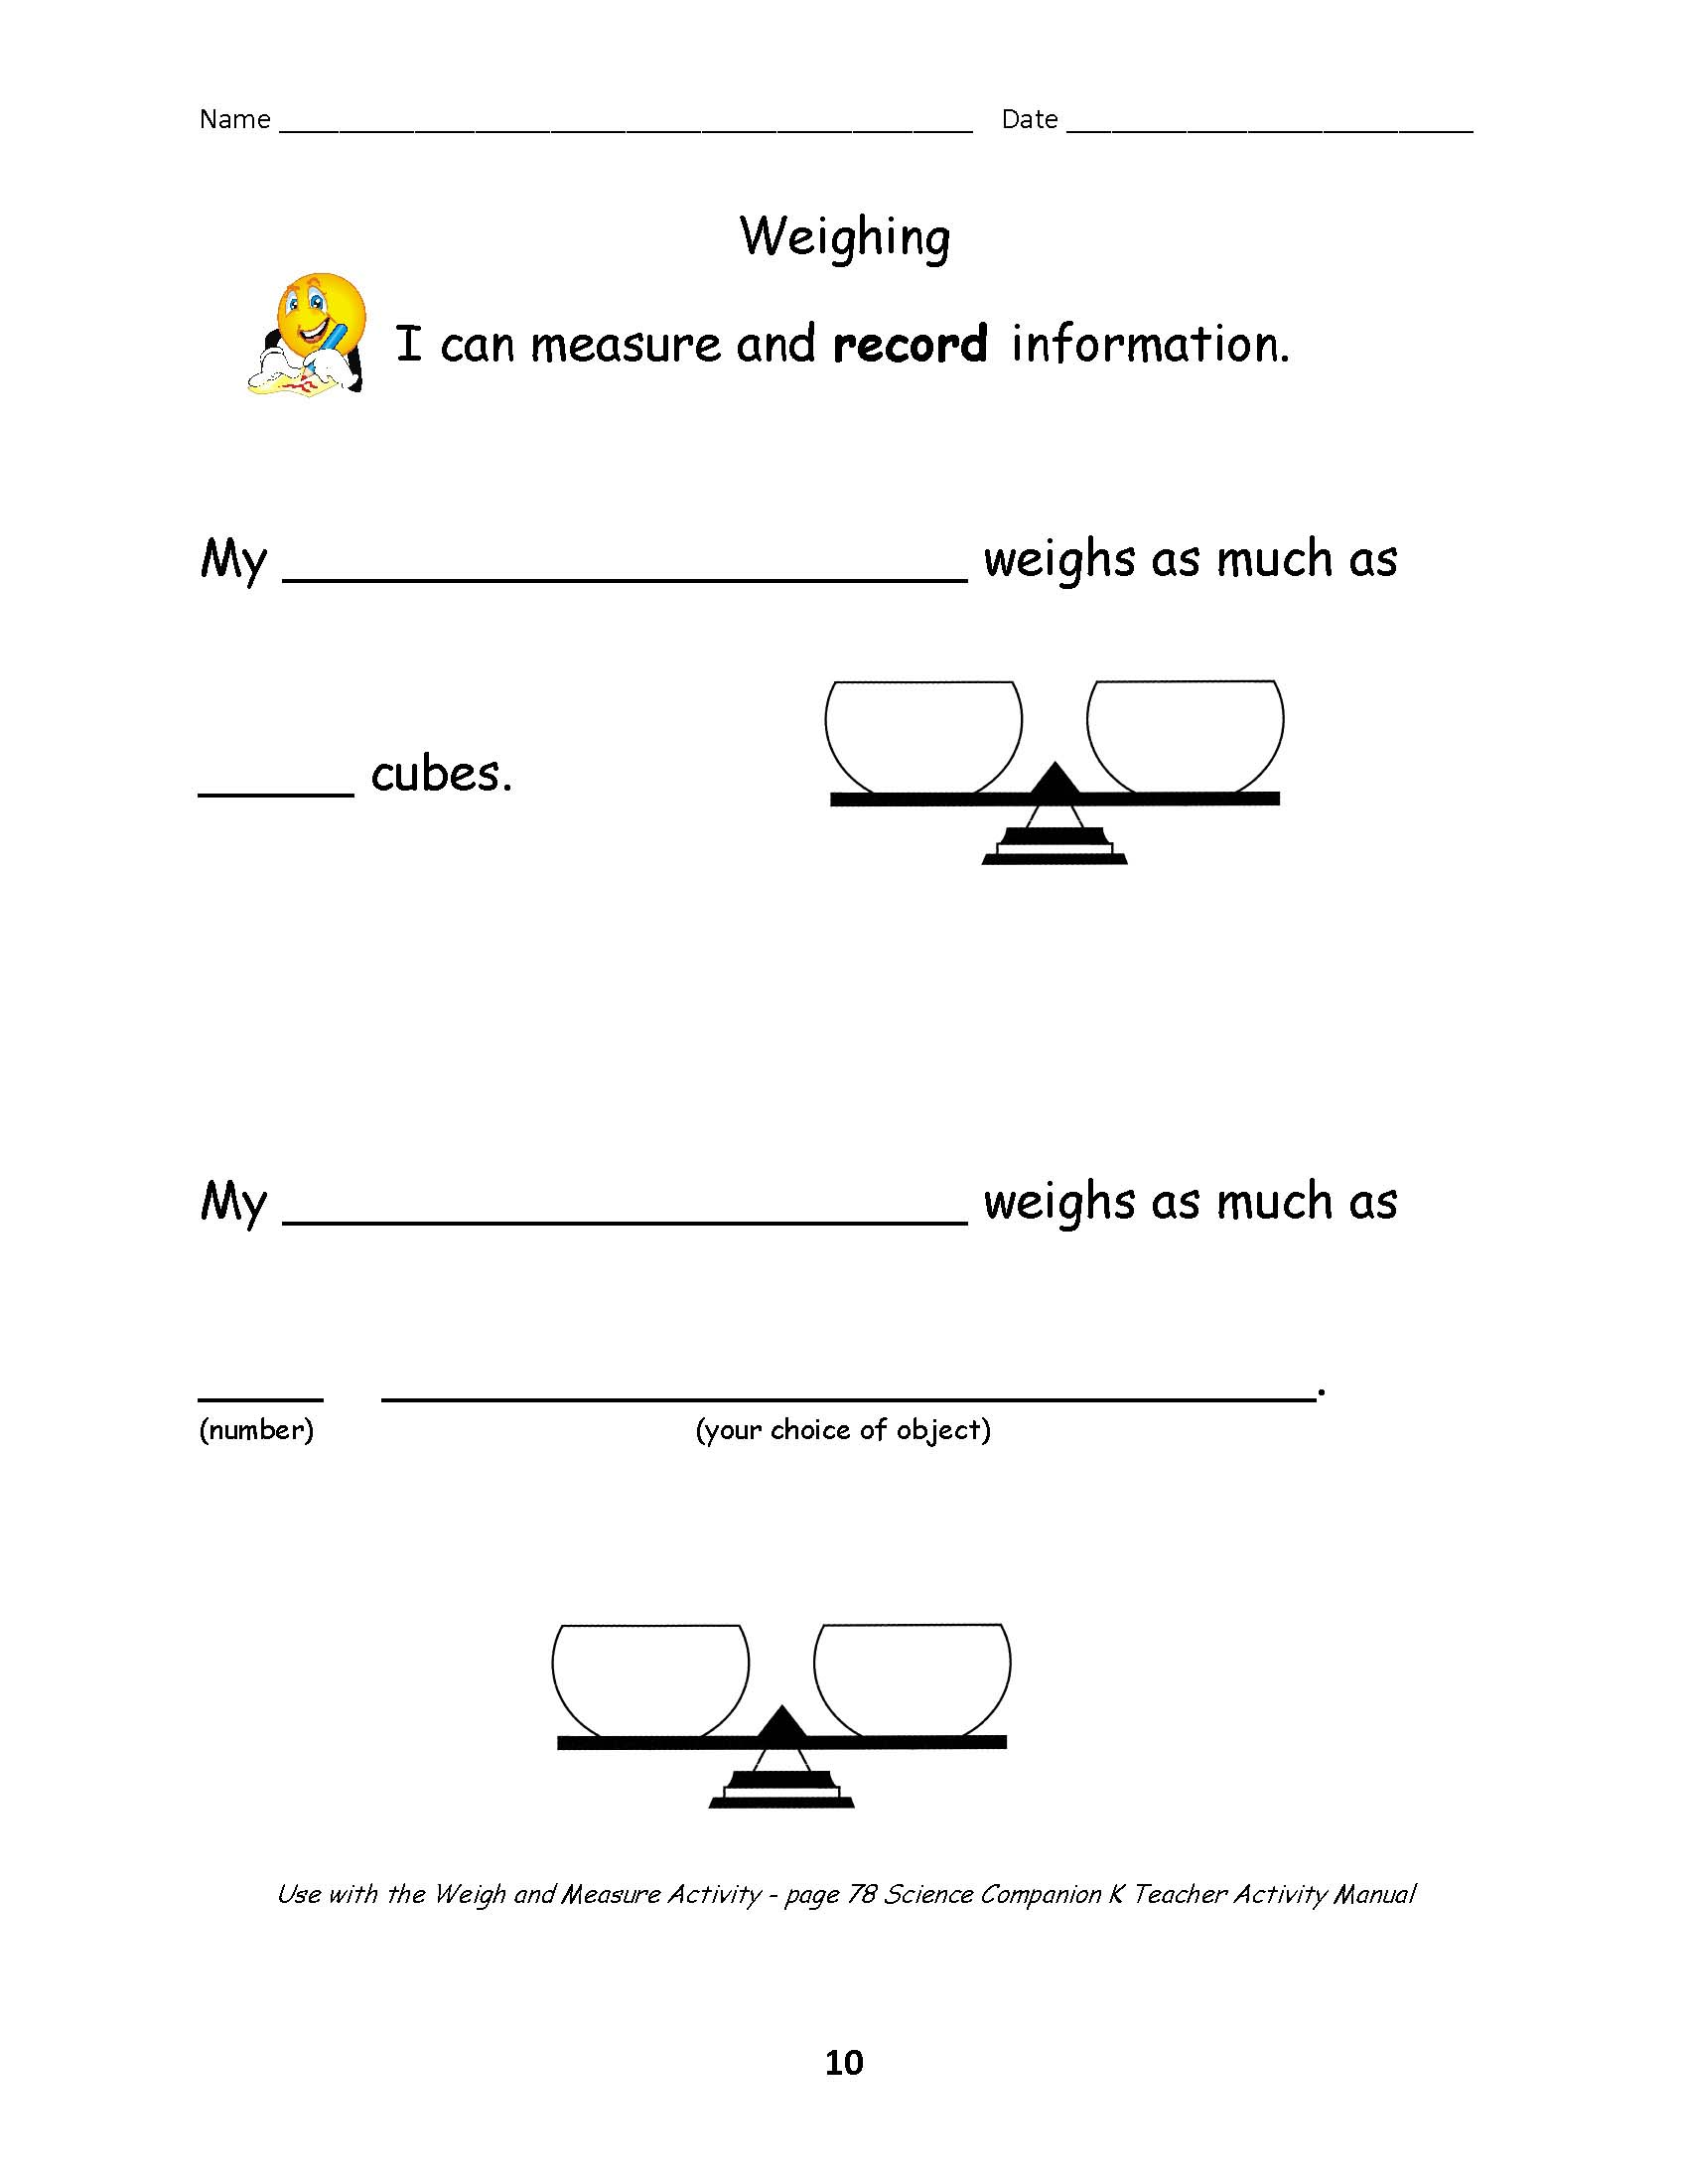 Worksheet Science 8 States Of Matter Worksheet Thedanks Worksheet